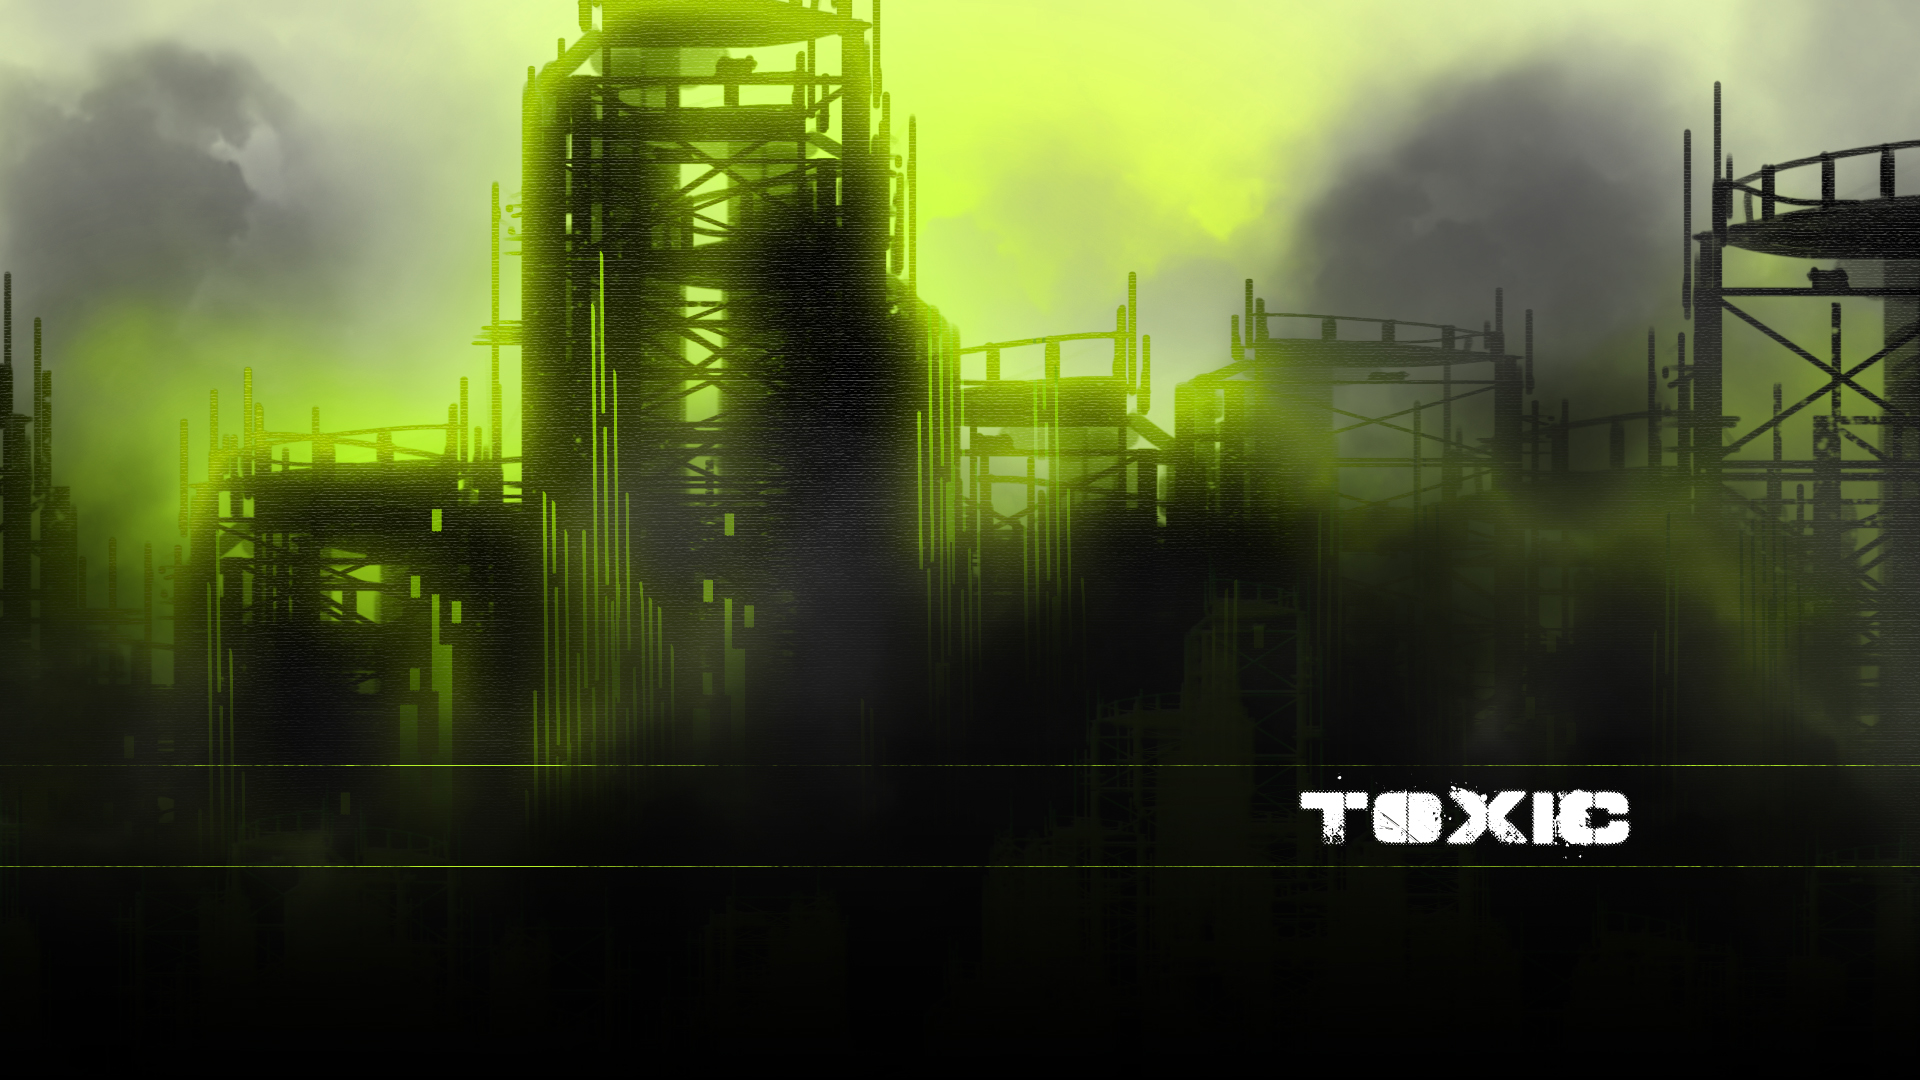 Toxic by CodenameOXIDE